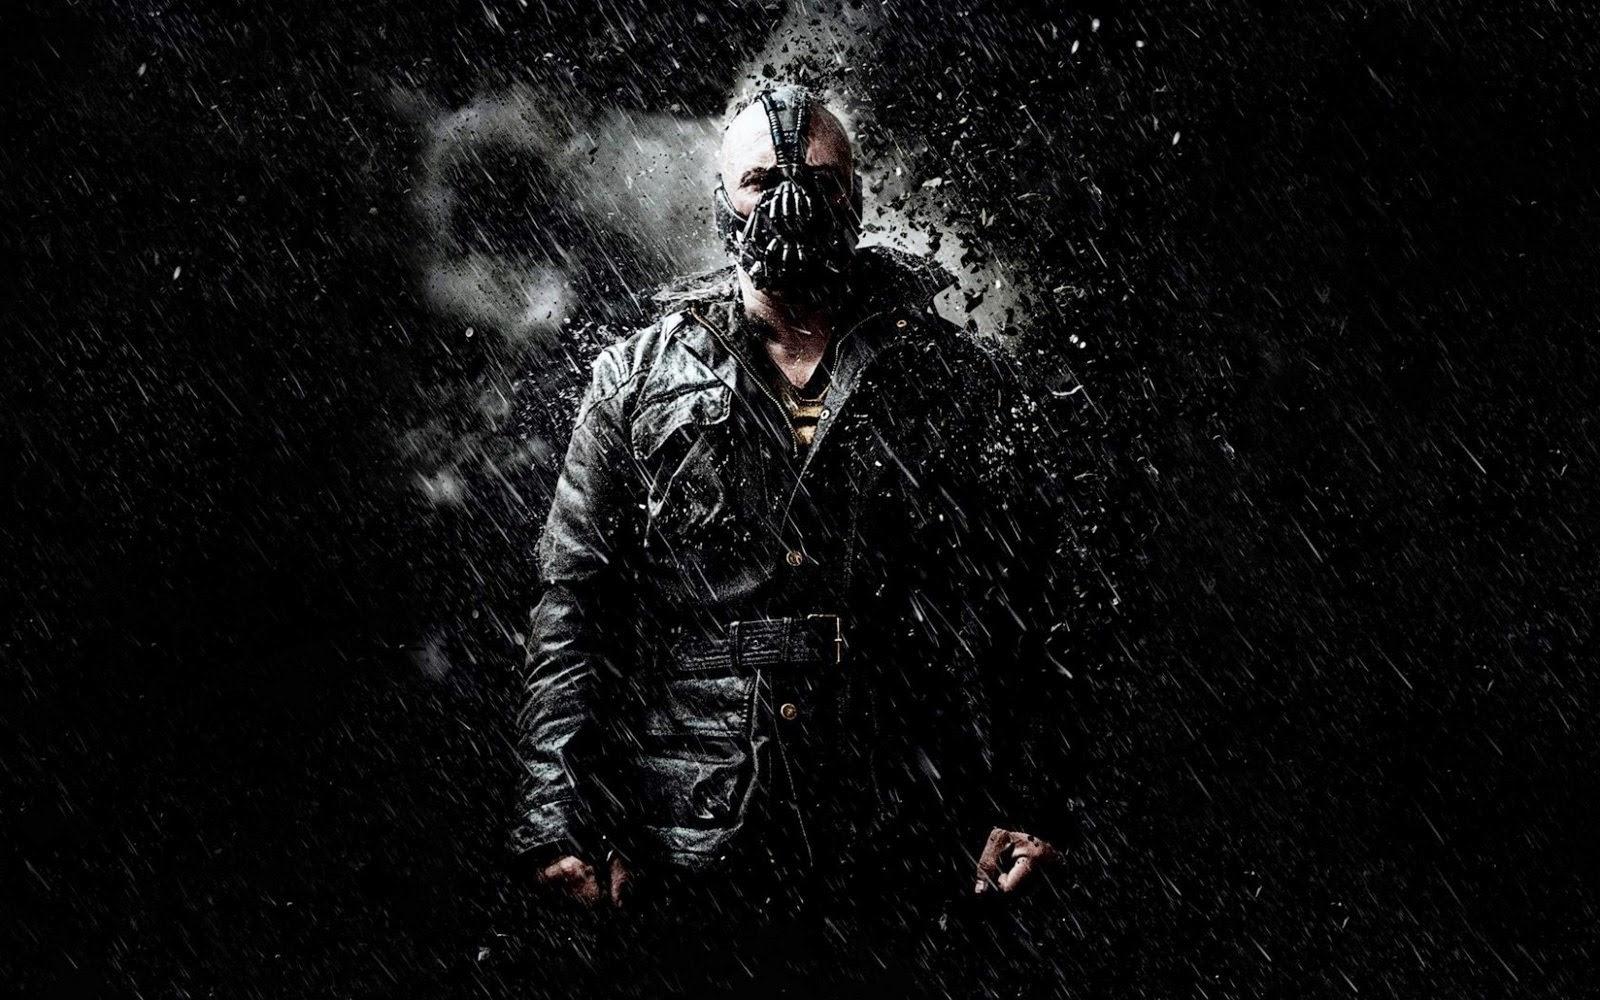 Bane The Dark Knight Rises Legend Superhero Comics HD ...